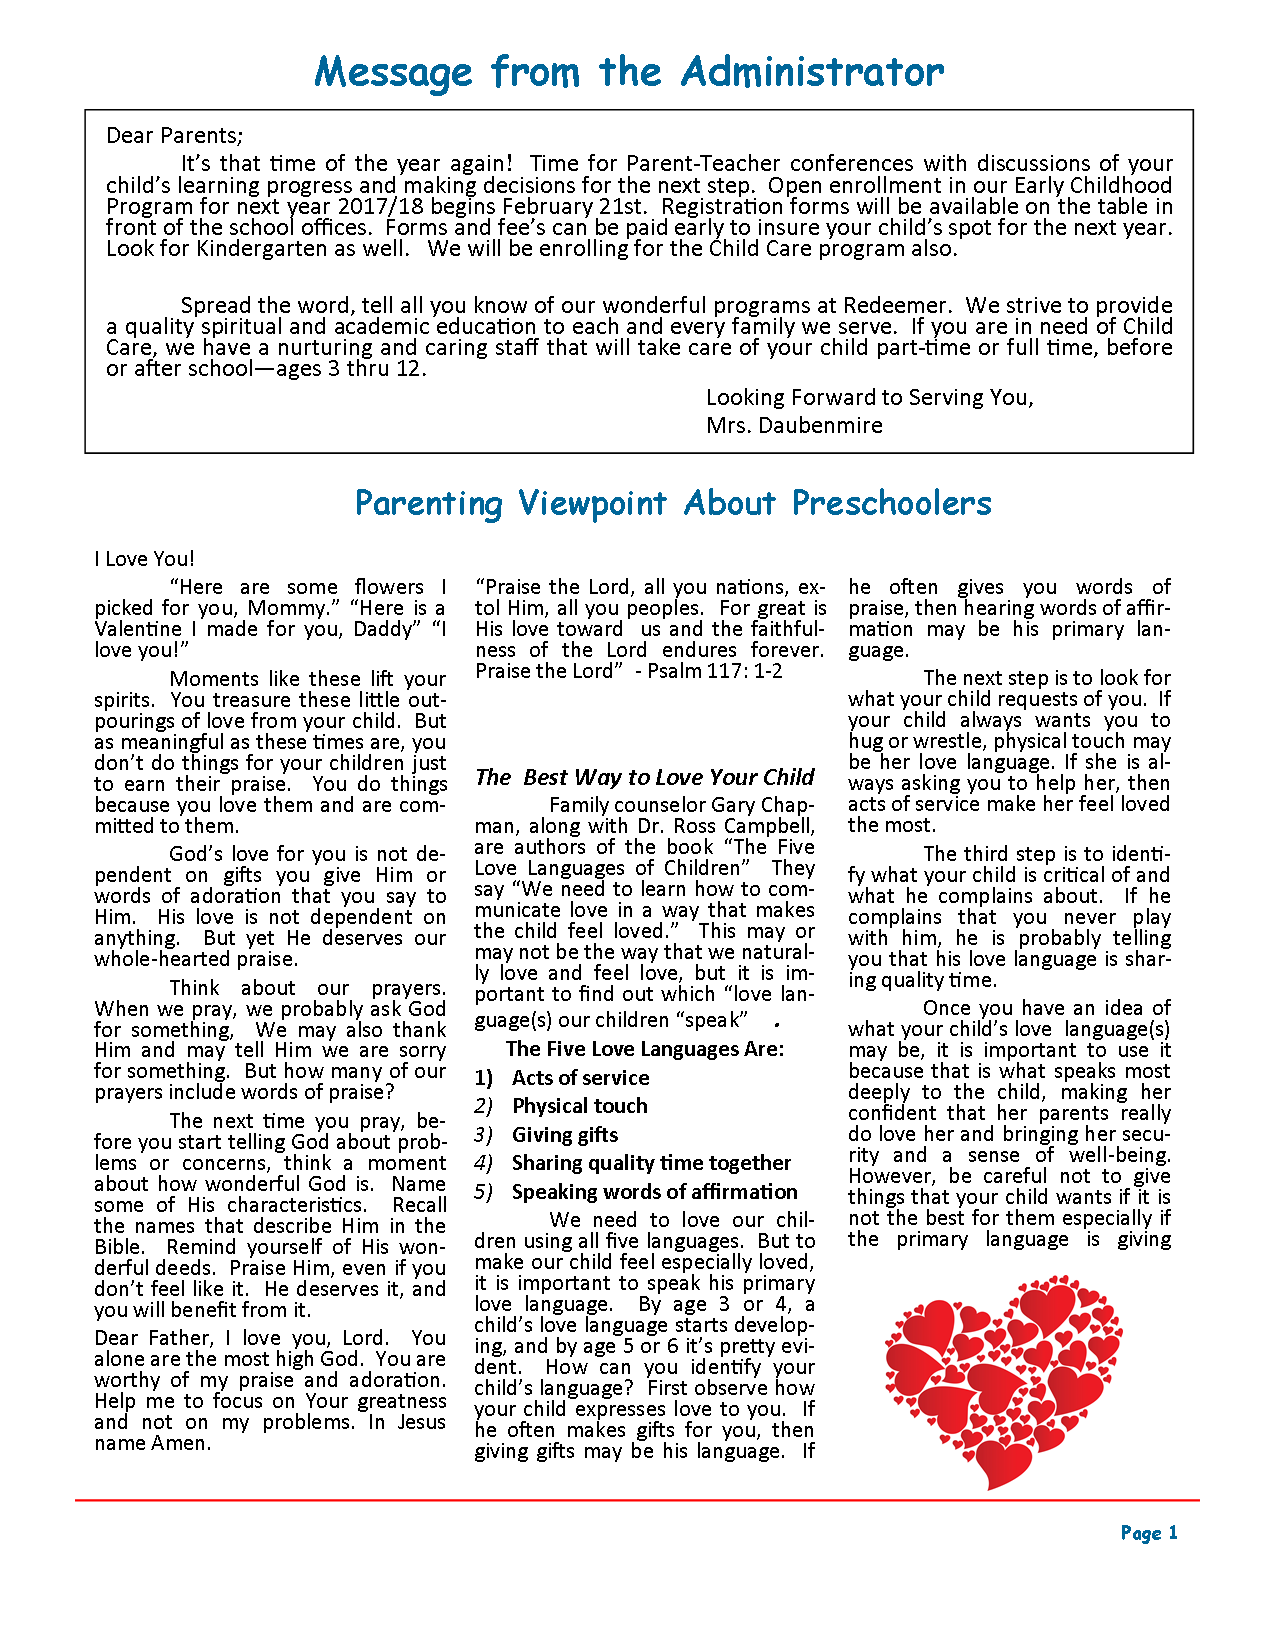 feb 17 draft page 2